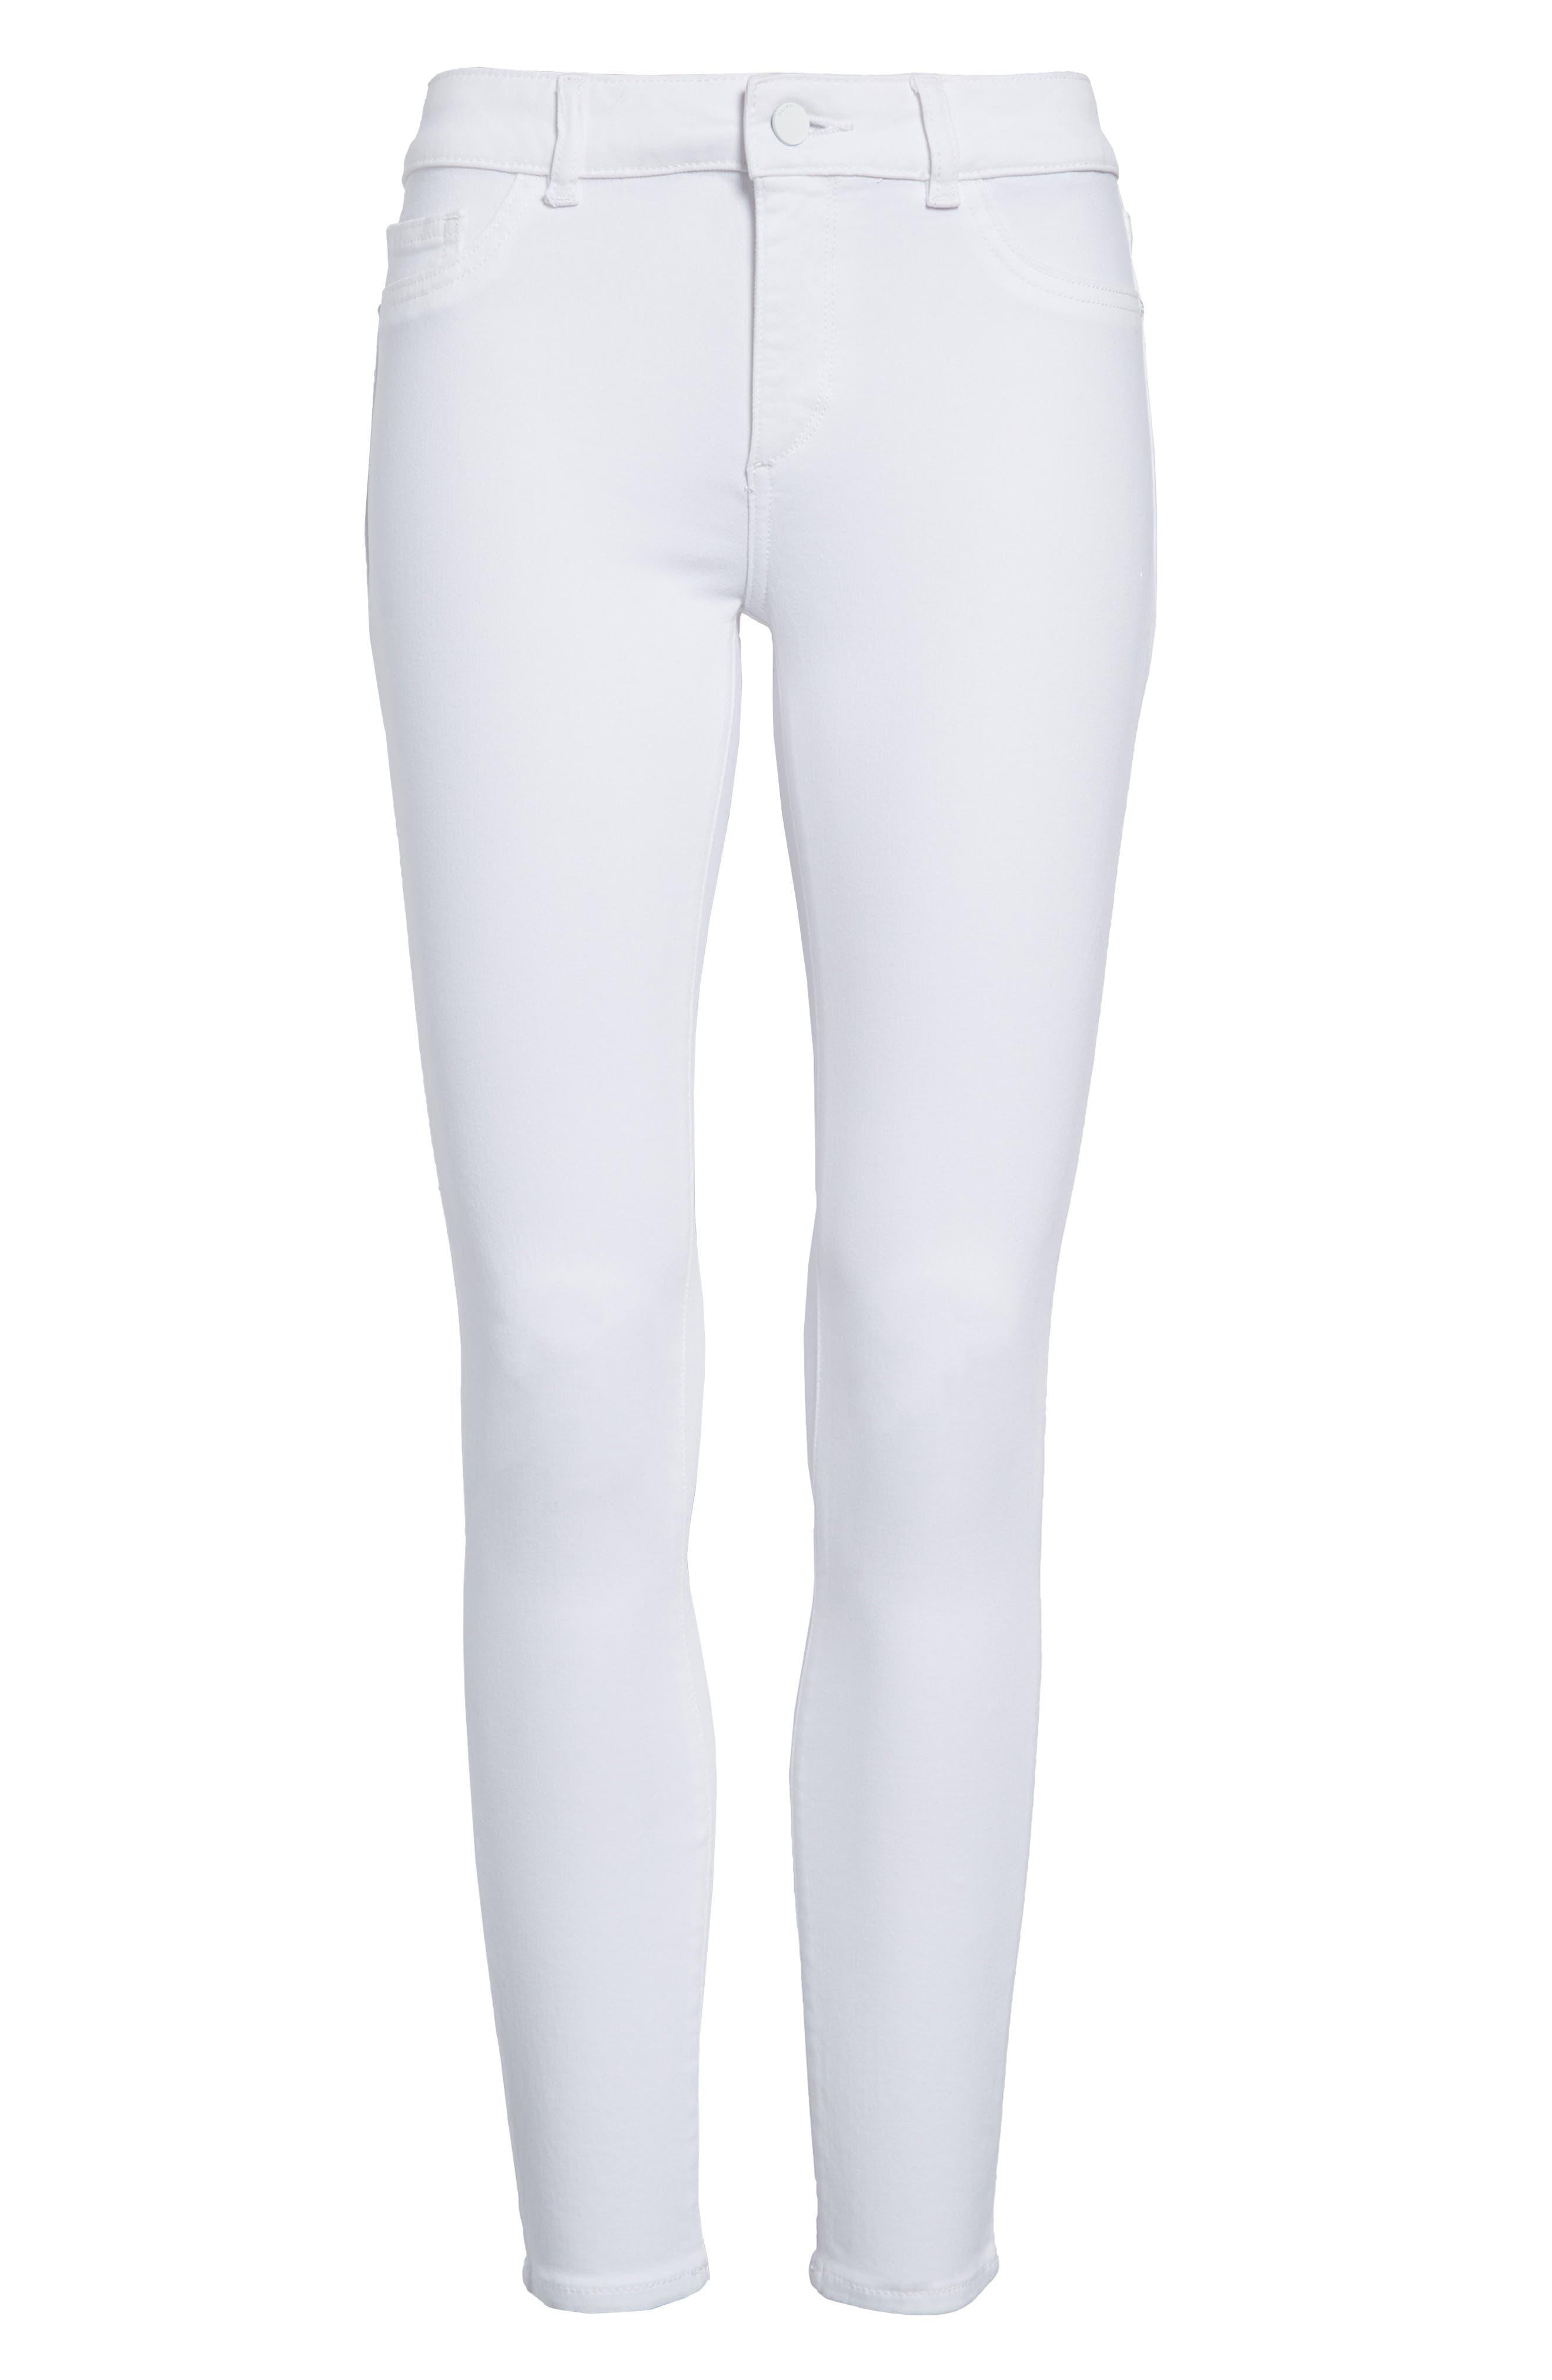 Margaux Instasculpt Ankle Skinny Jeans,                             Alternate thumbnail 7, color,                             100